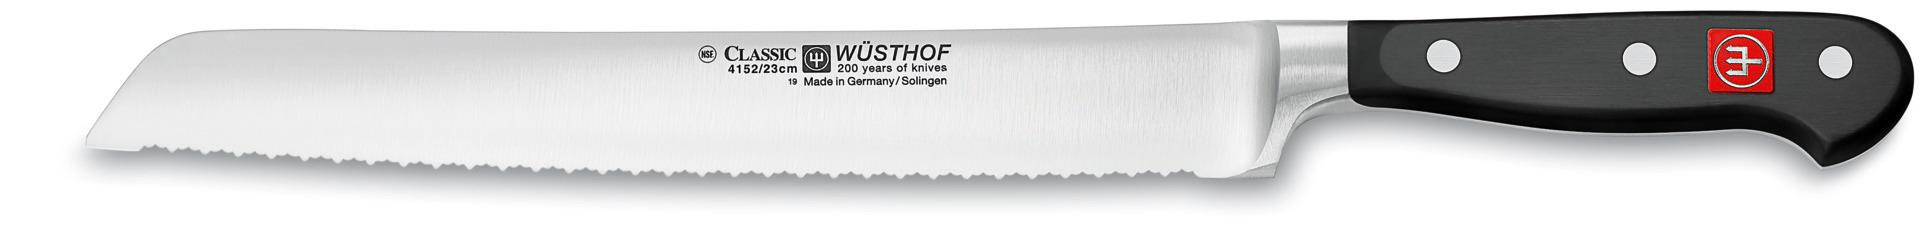 Brotmesser mit Doppelwelle  Klingenlänge 230 mm / 360 mm lang